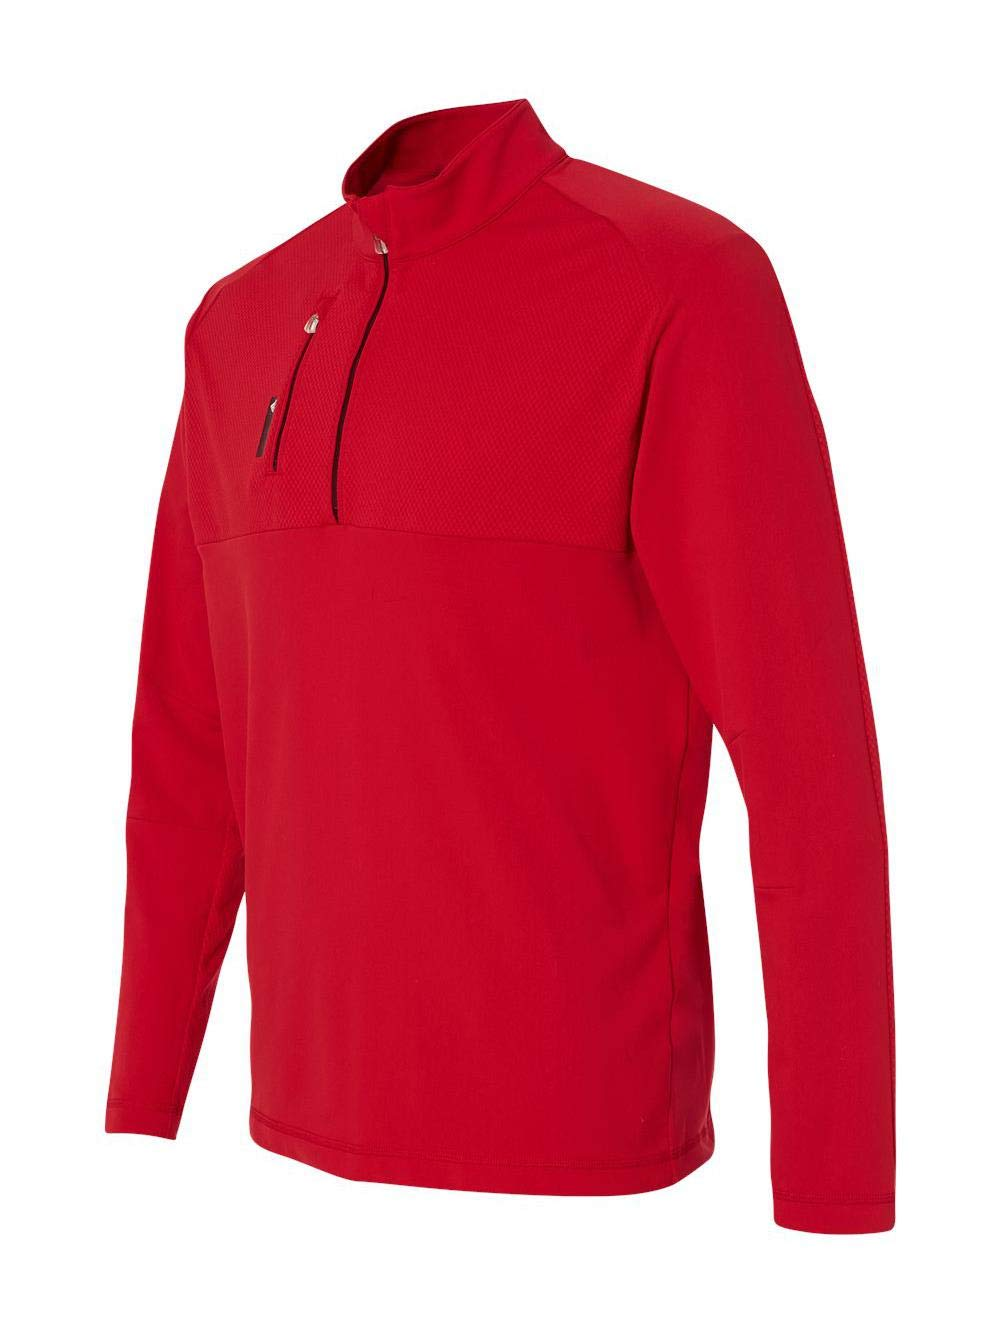 adidas Golf Mens Puremotion Mixed Media Quarter-Zip (A195) -BLD RED/AM -M